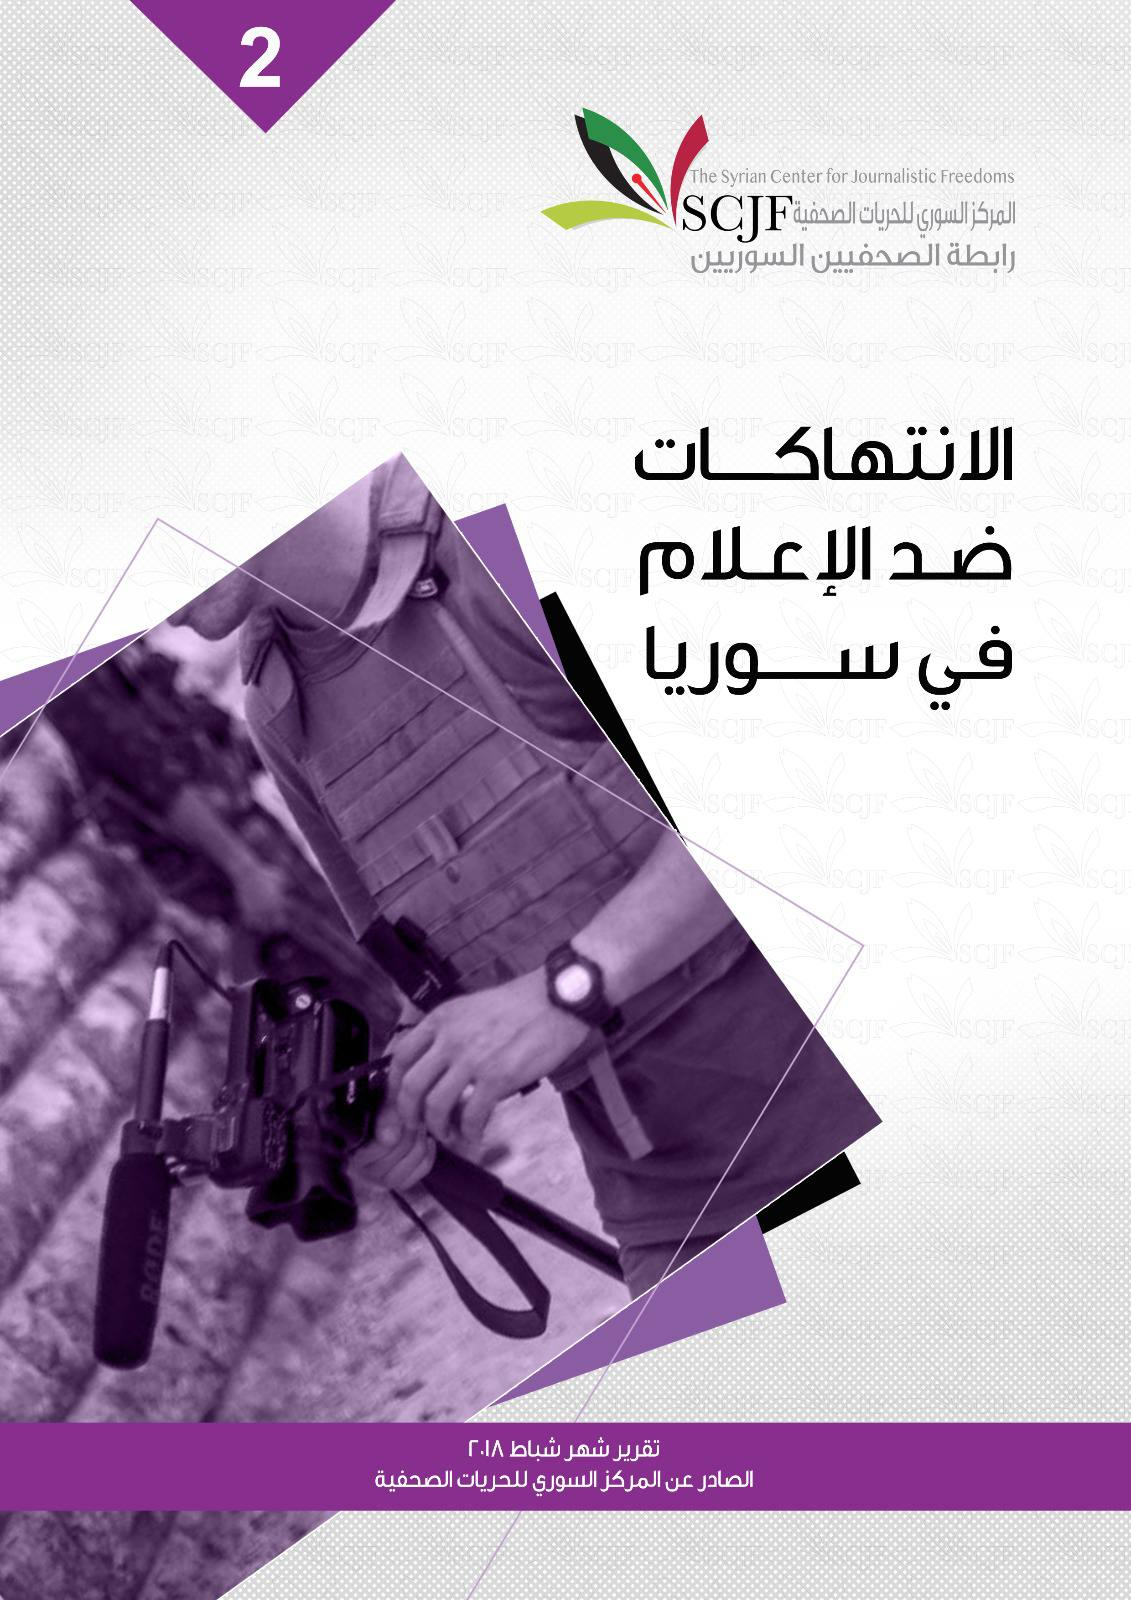 غلاف عربي